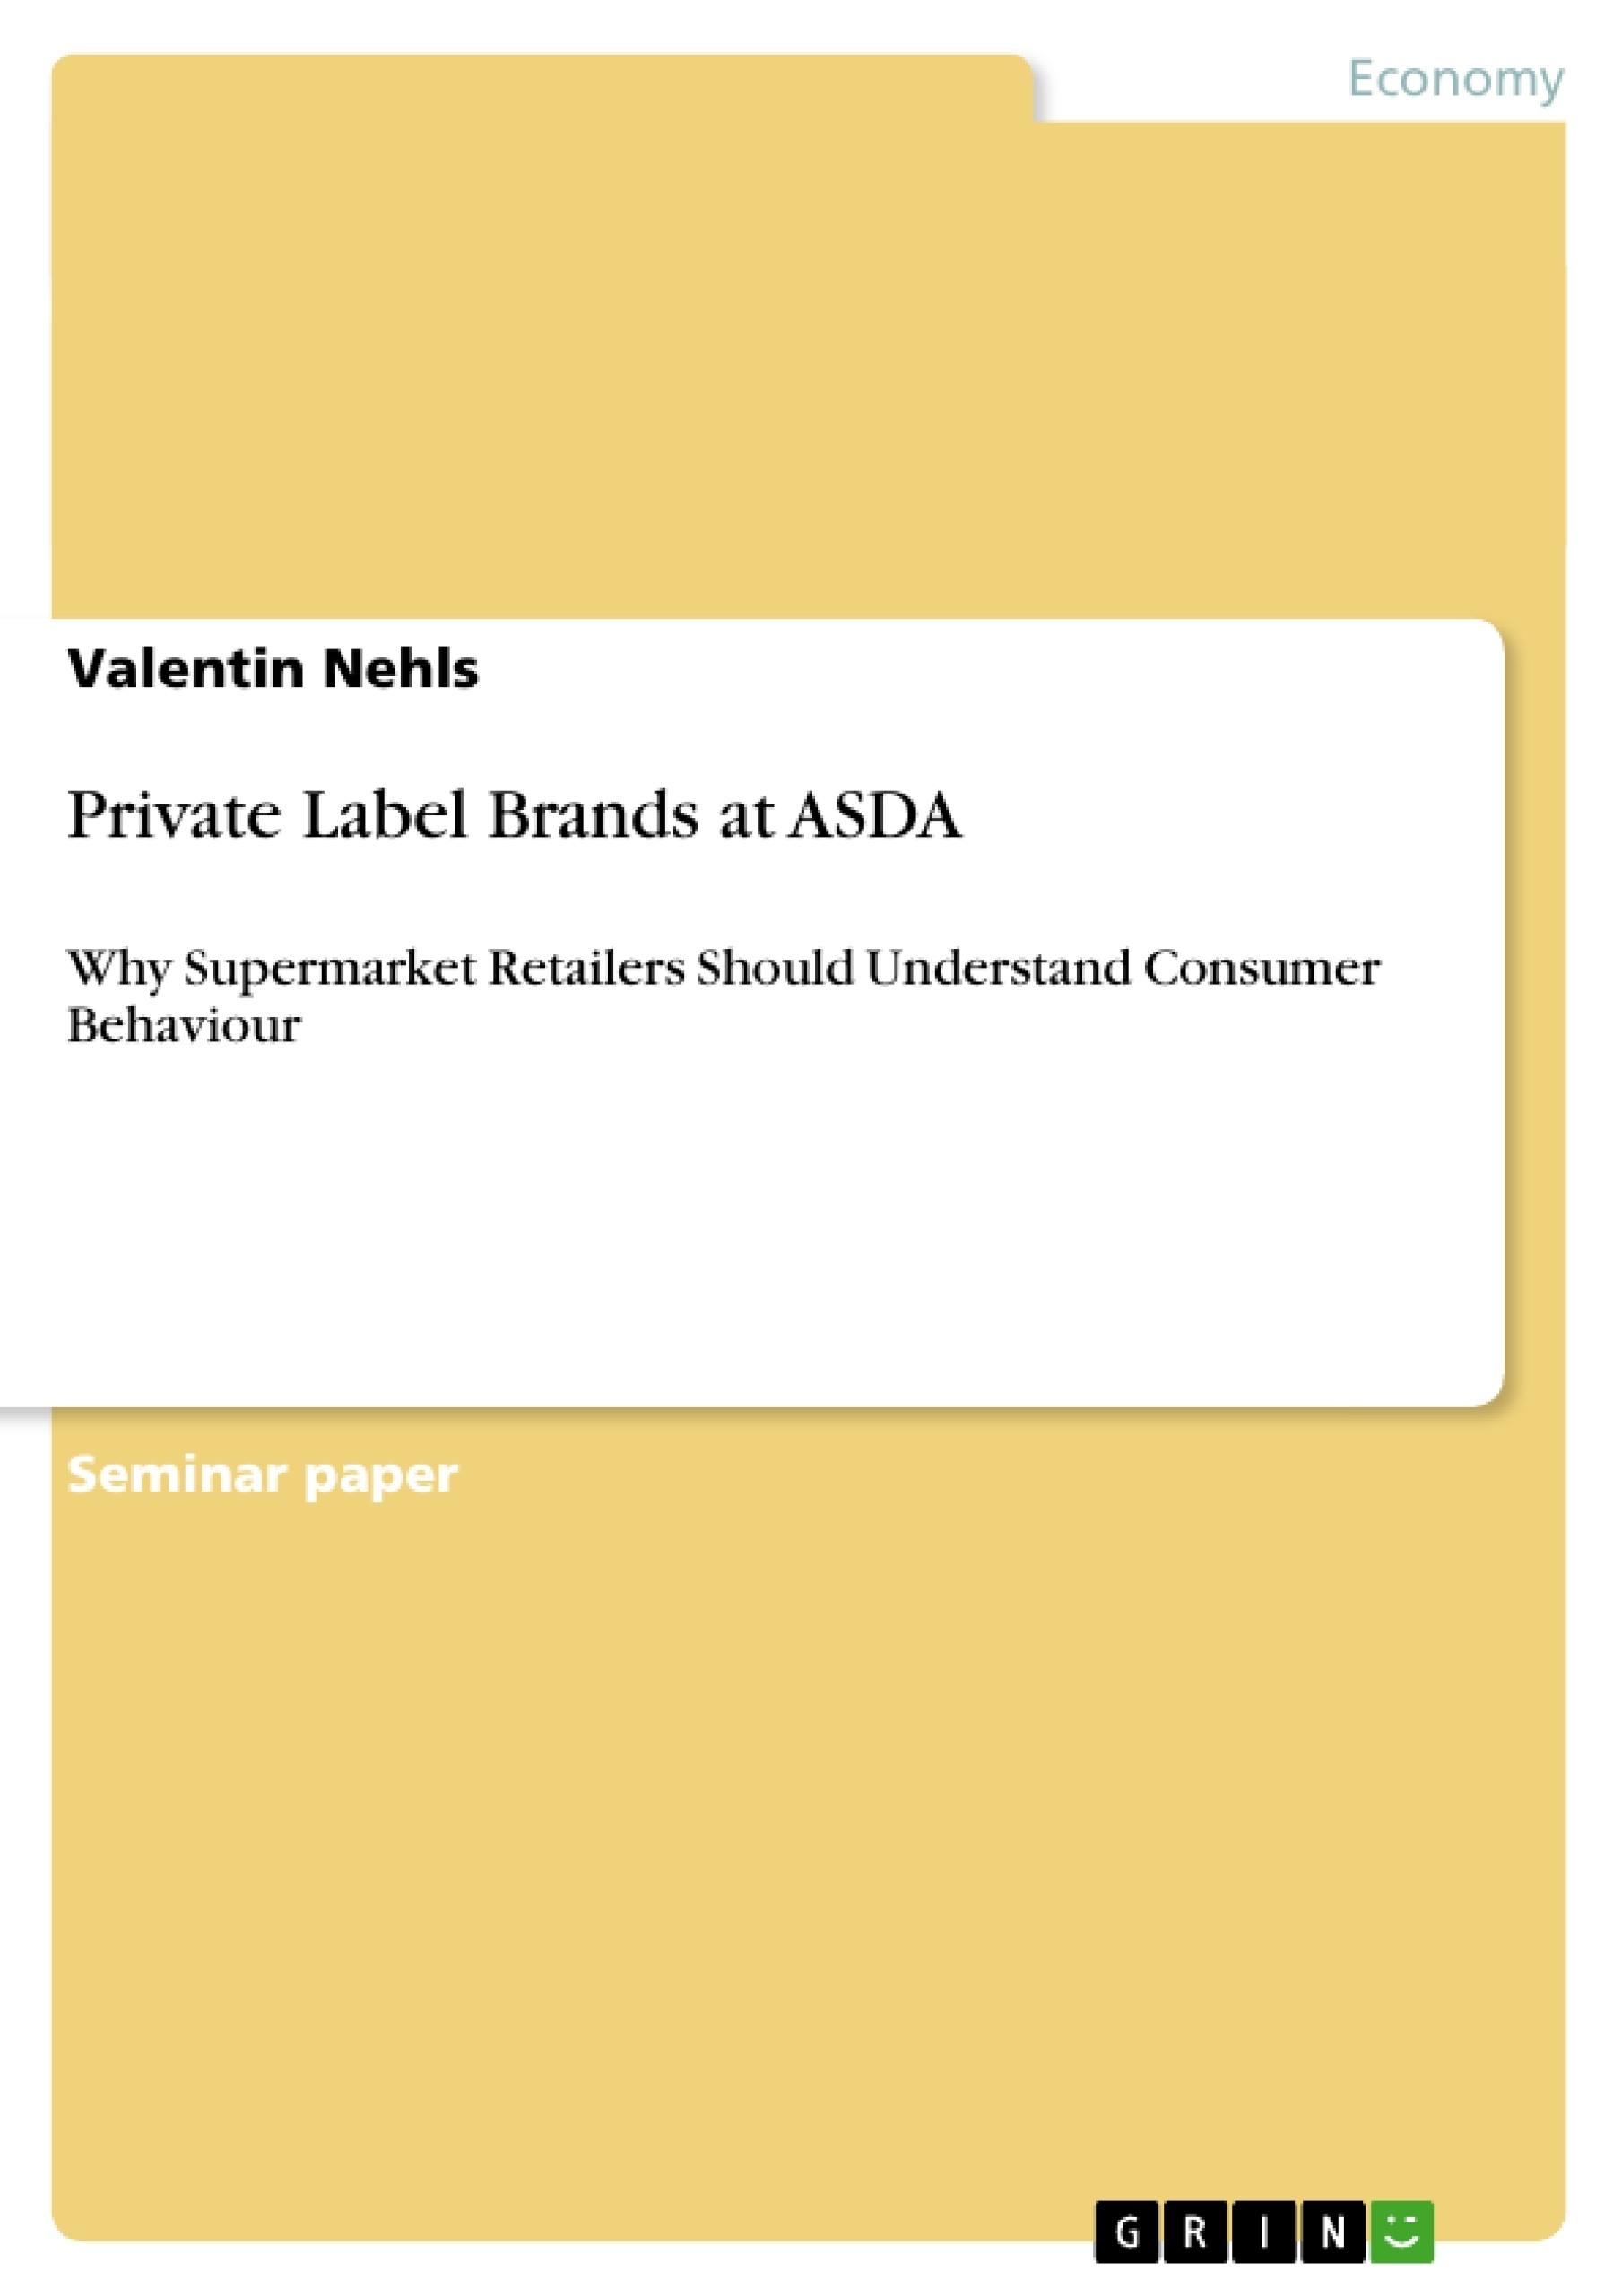 Title: Private Label Brands at ASDA